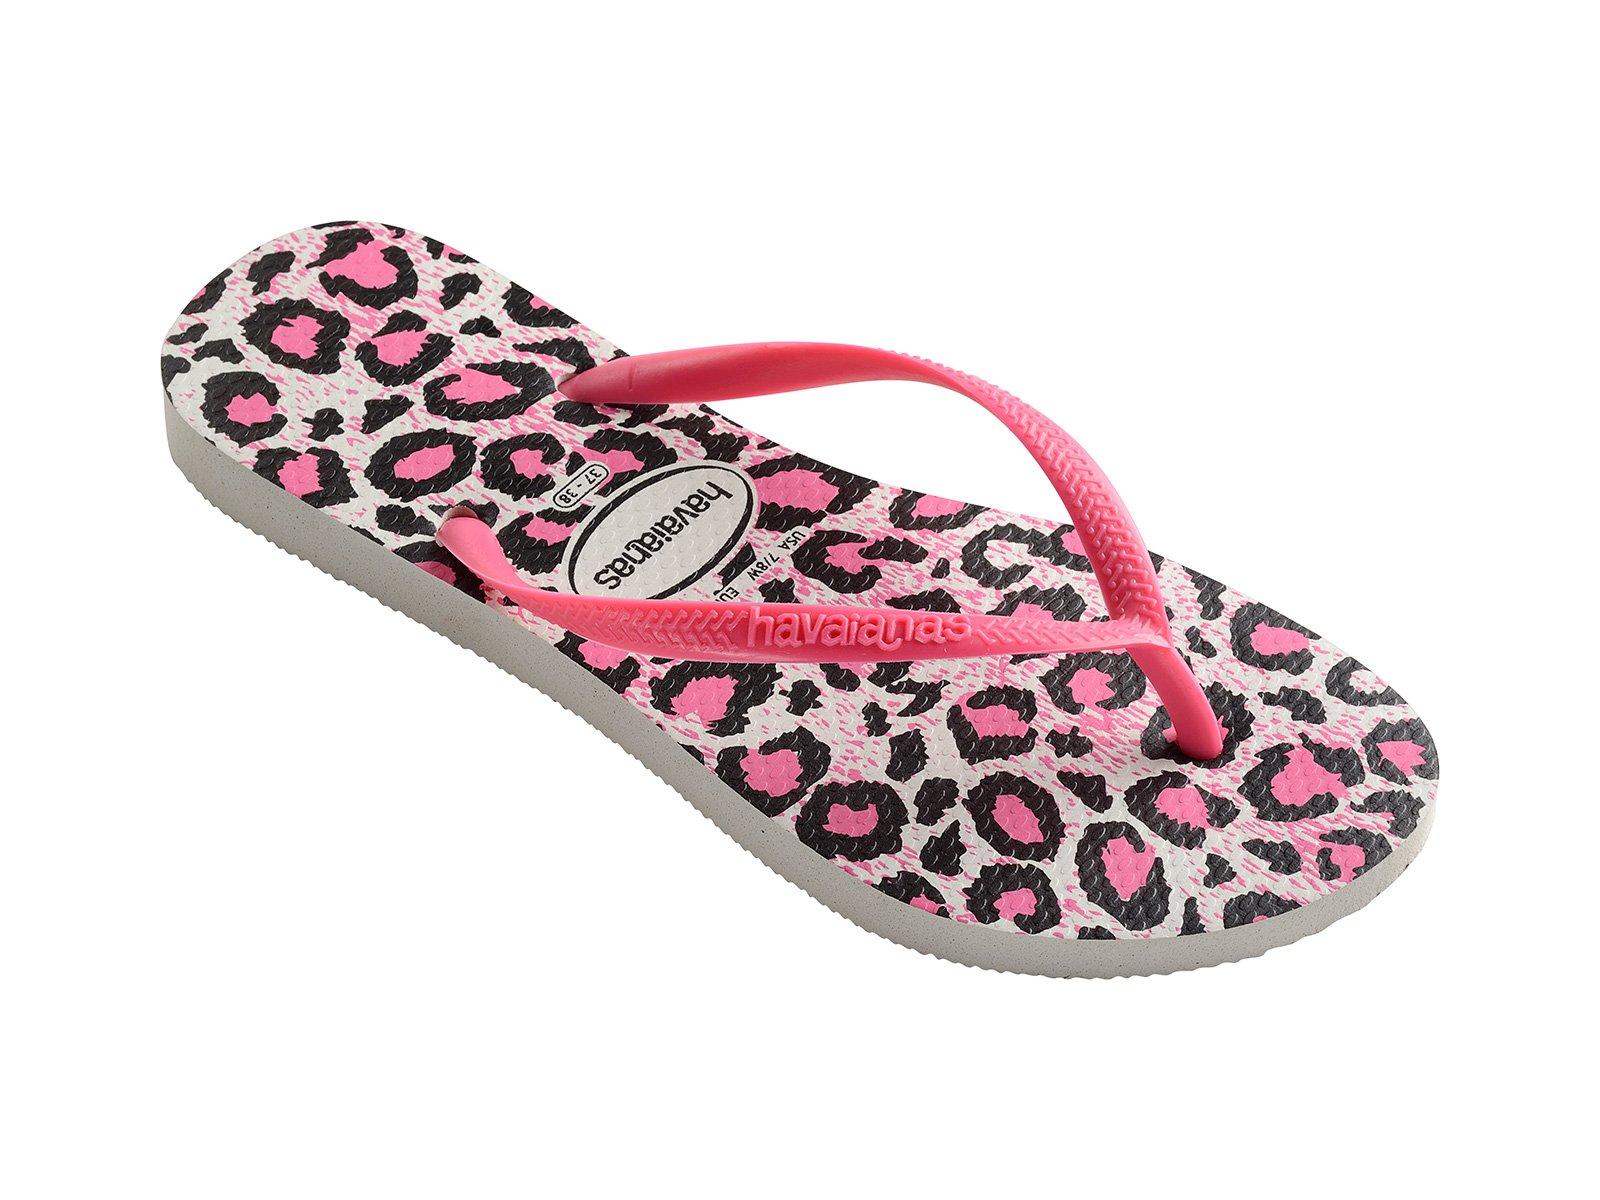 9c4355f83958 Pink And White Leopard Print Flip-flops - Slim Animals White rose -  Havaianas